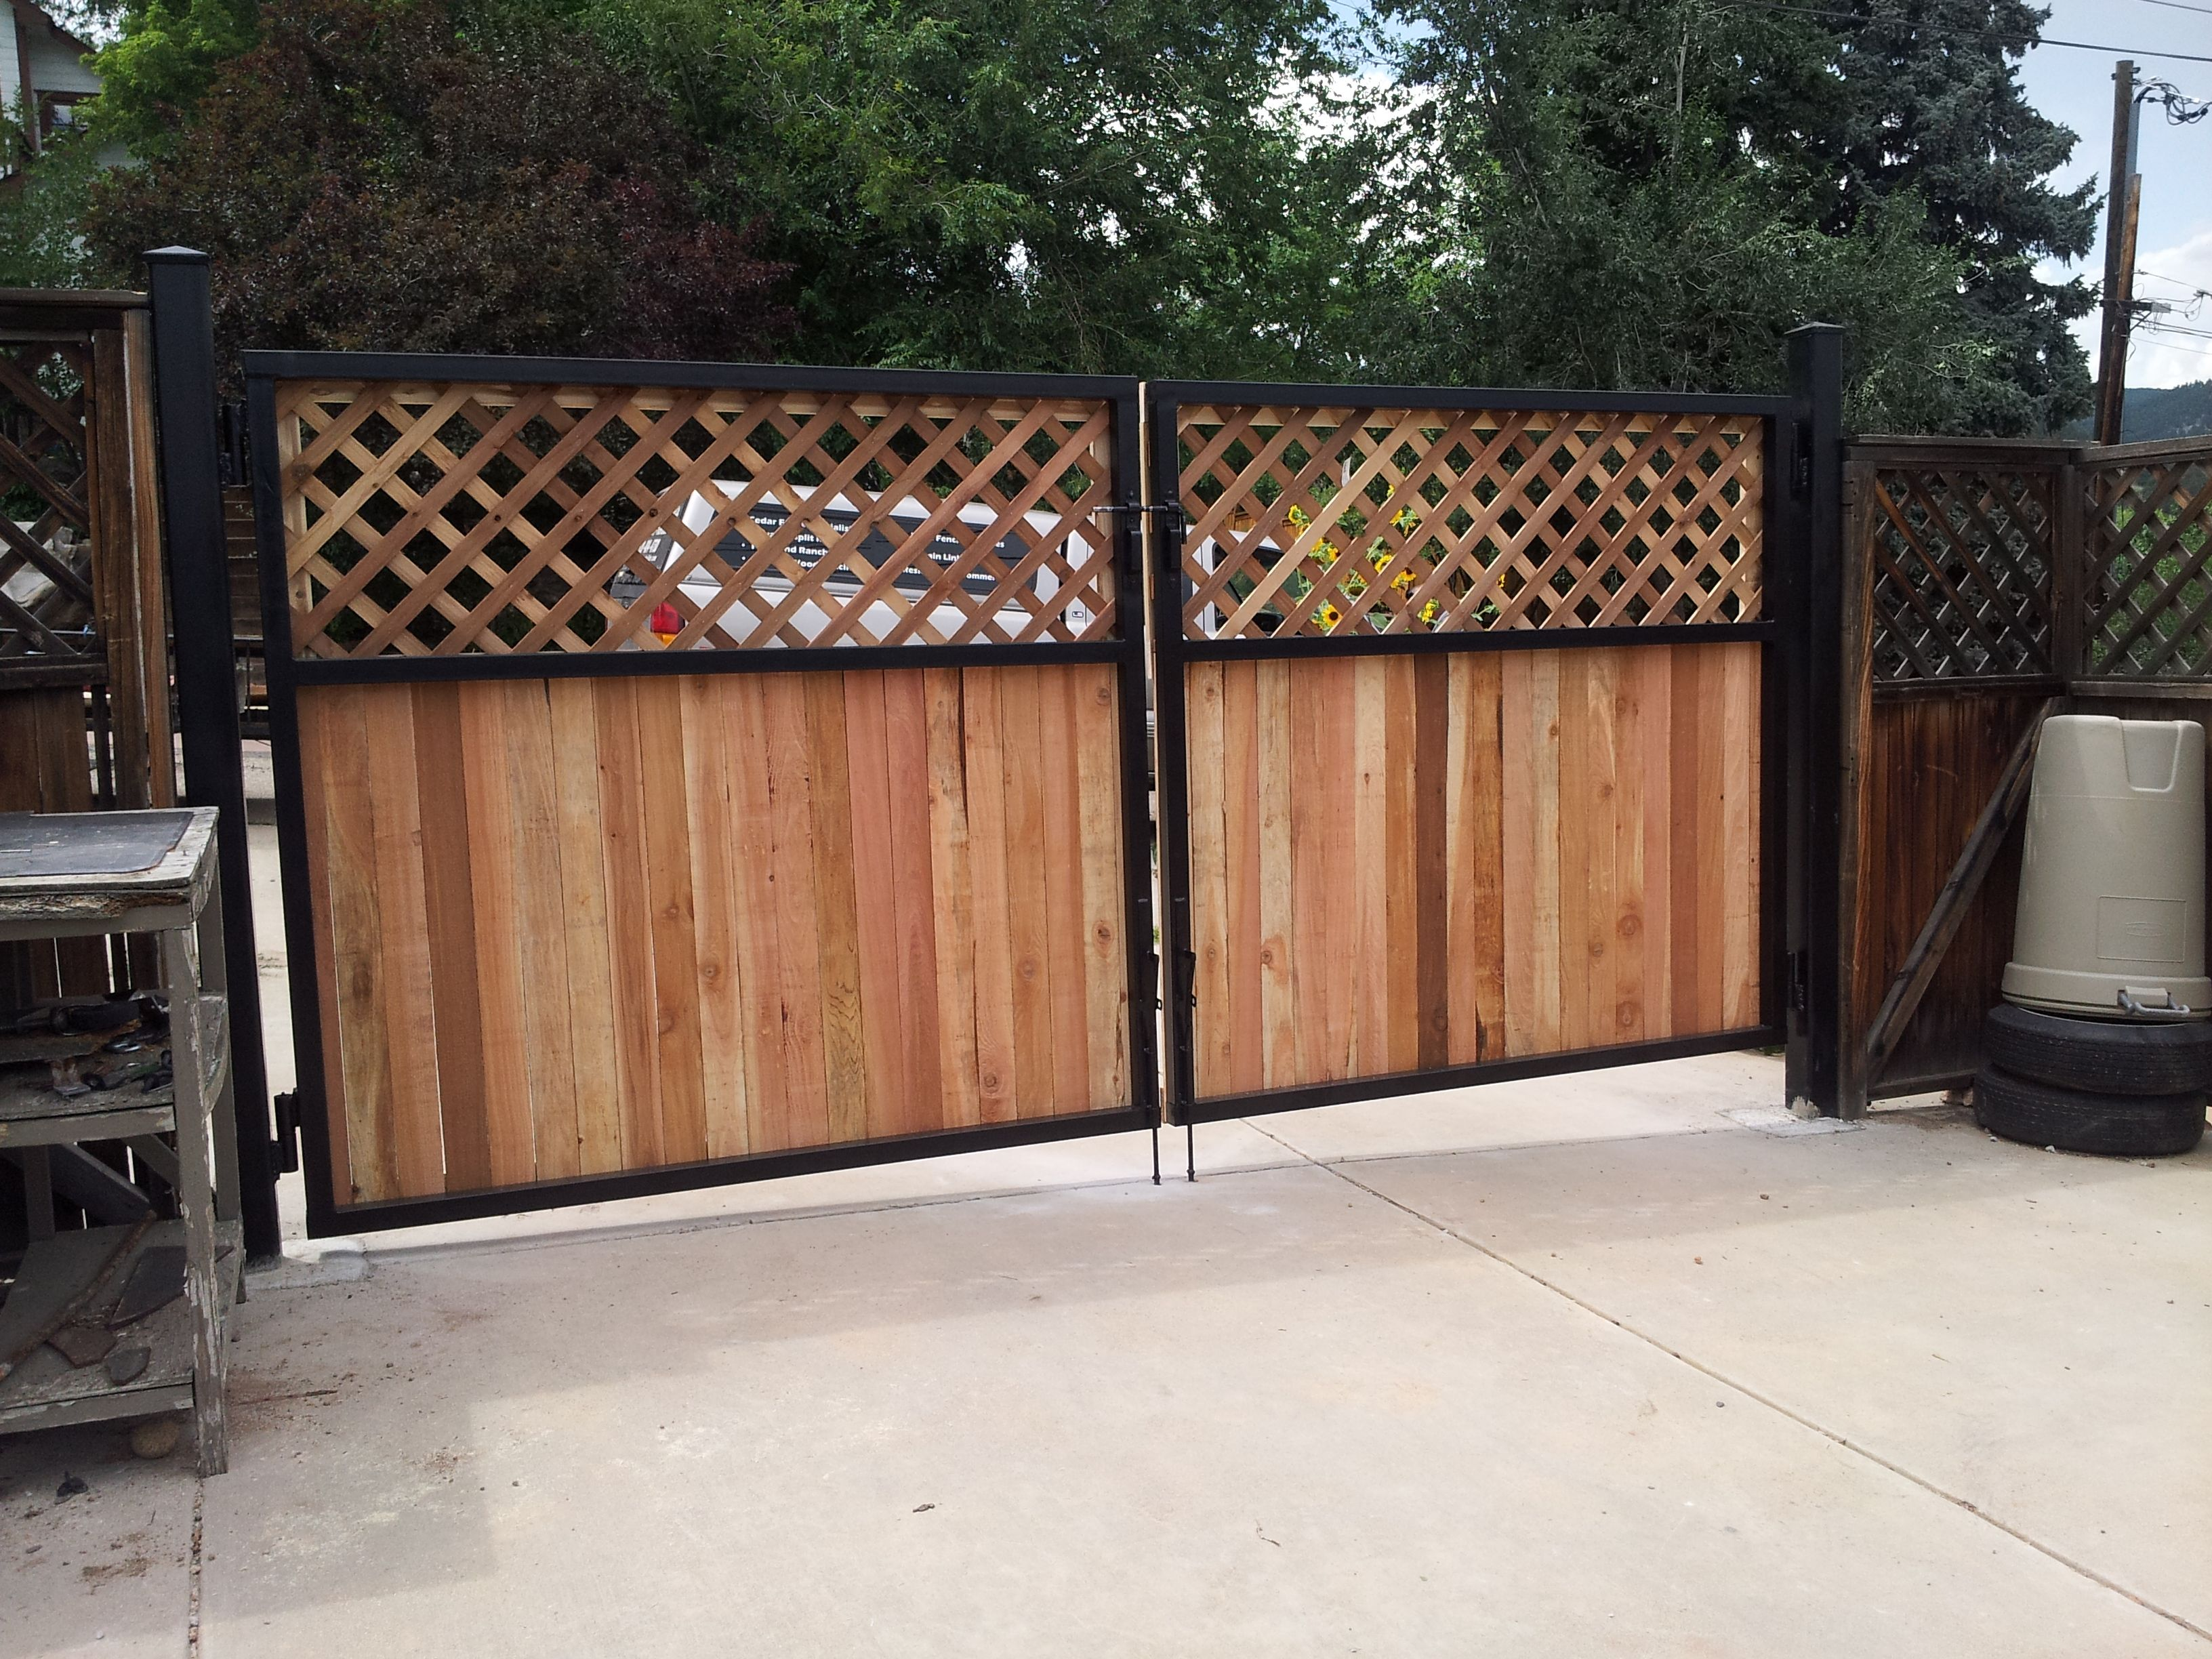 Iron Gate With Cedar No Lattice But Vertical Iron Slats On Top Cedar Steel Lattice Top Double Drive Gates Boulder Wrought Iron Fences Iron Fence Drive Gates